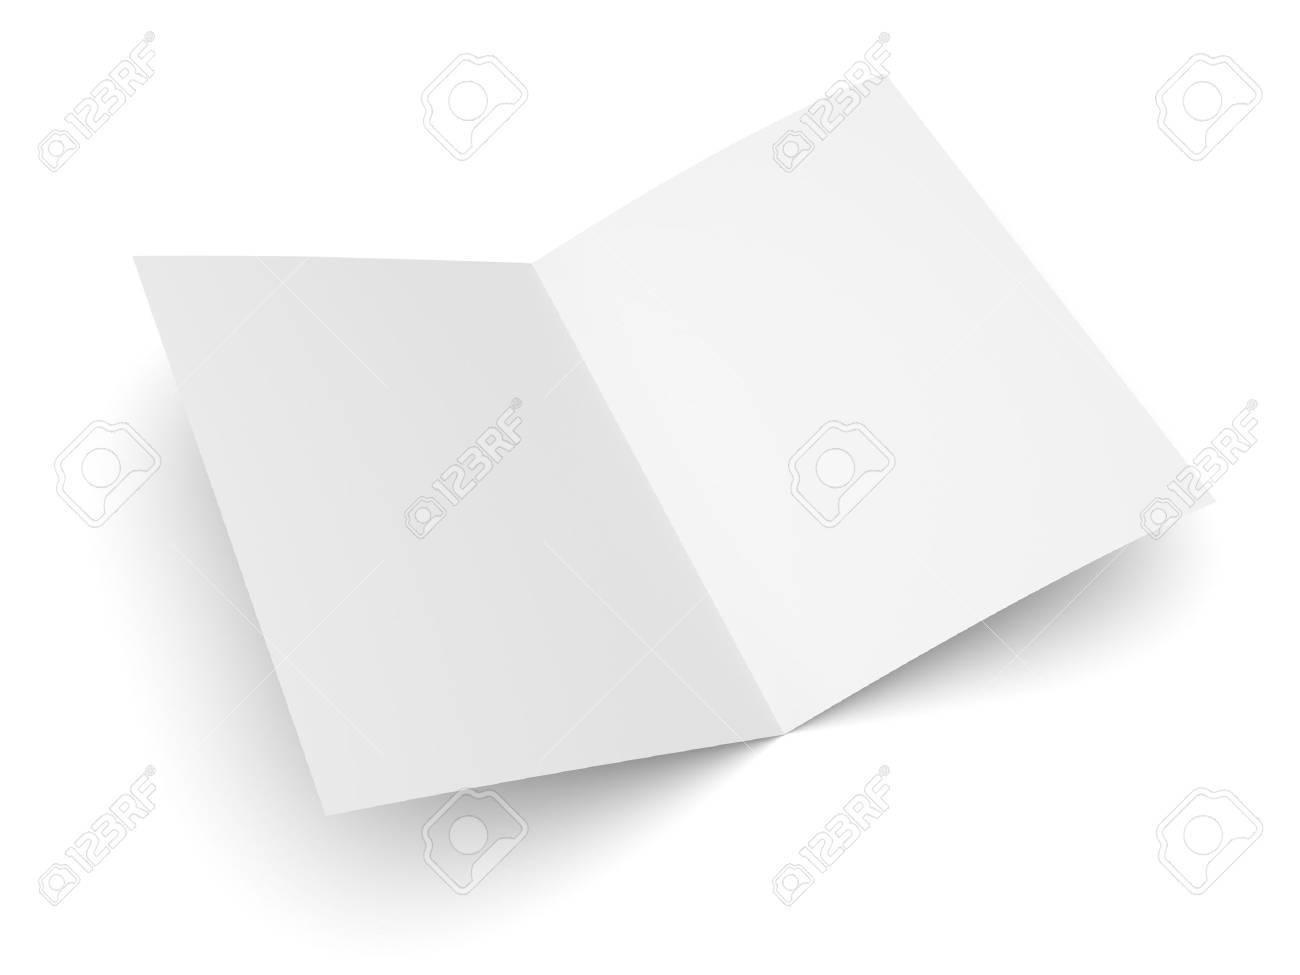 Blank Gefaltet Flyer, Broschüre, Postkarte, Visitenkarte Oder ...